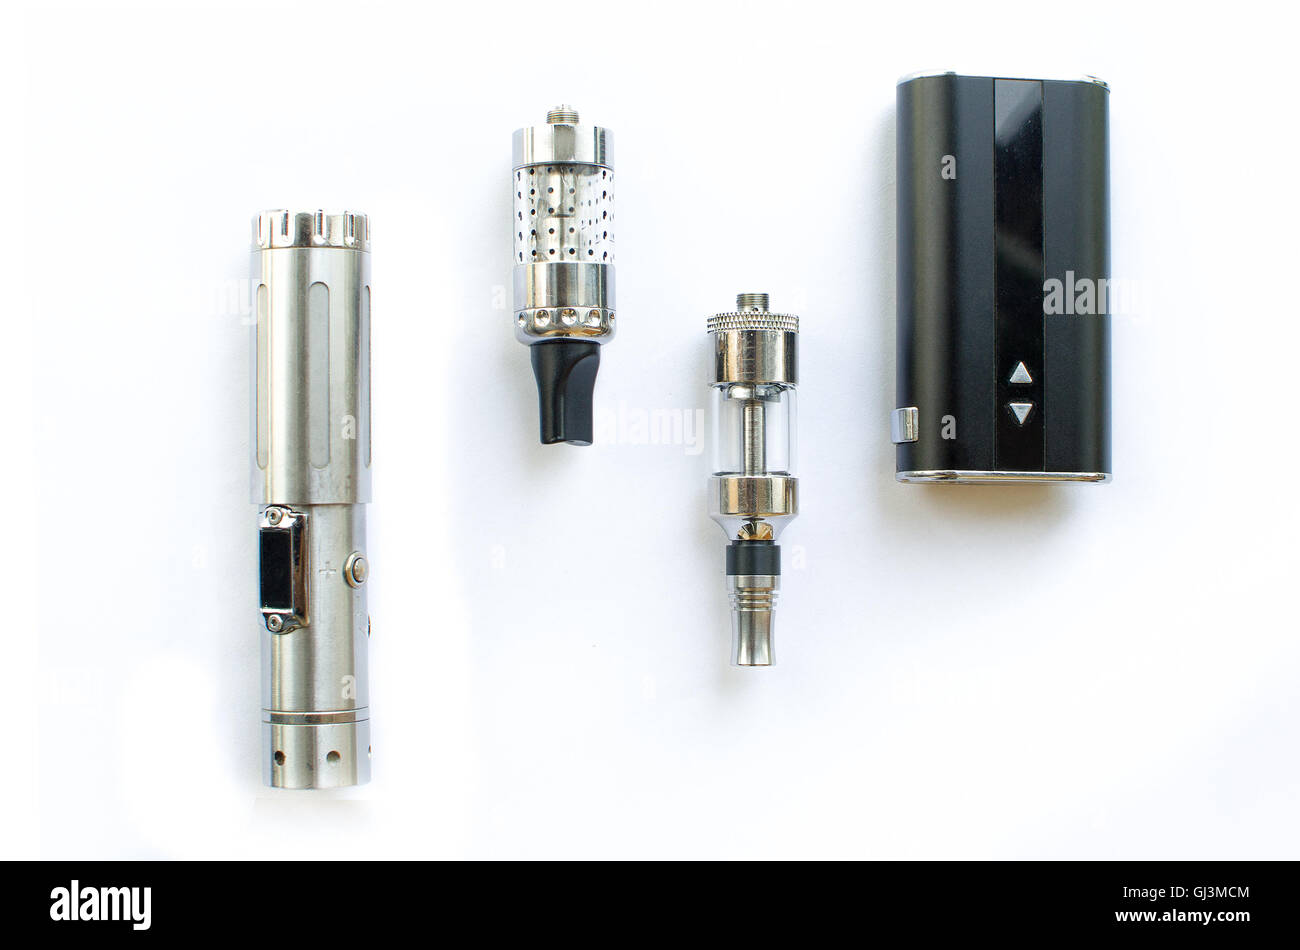 Electronic Cigarettes big battery - Stock Image